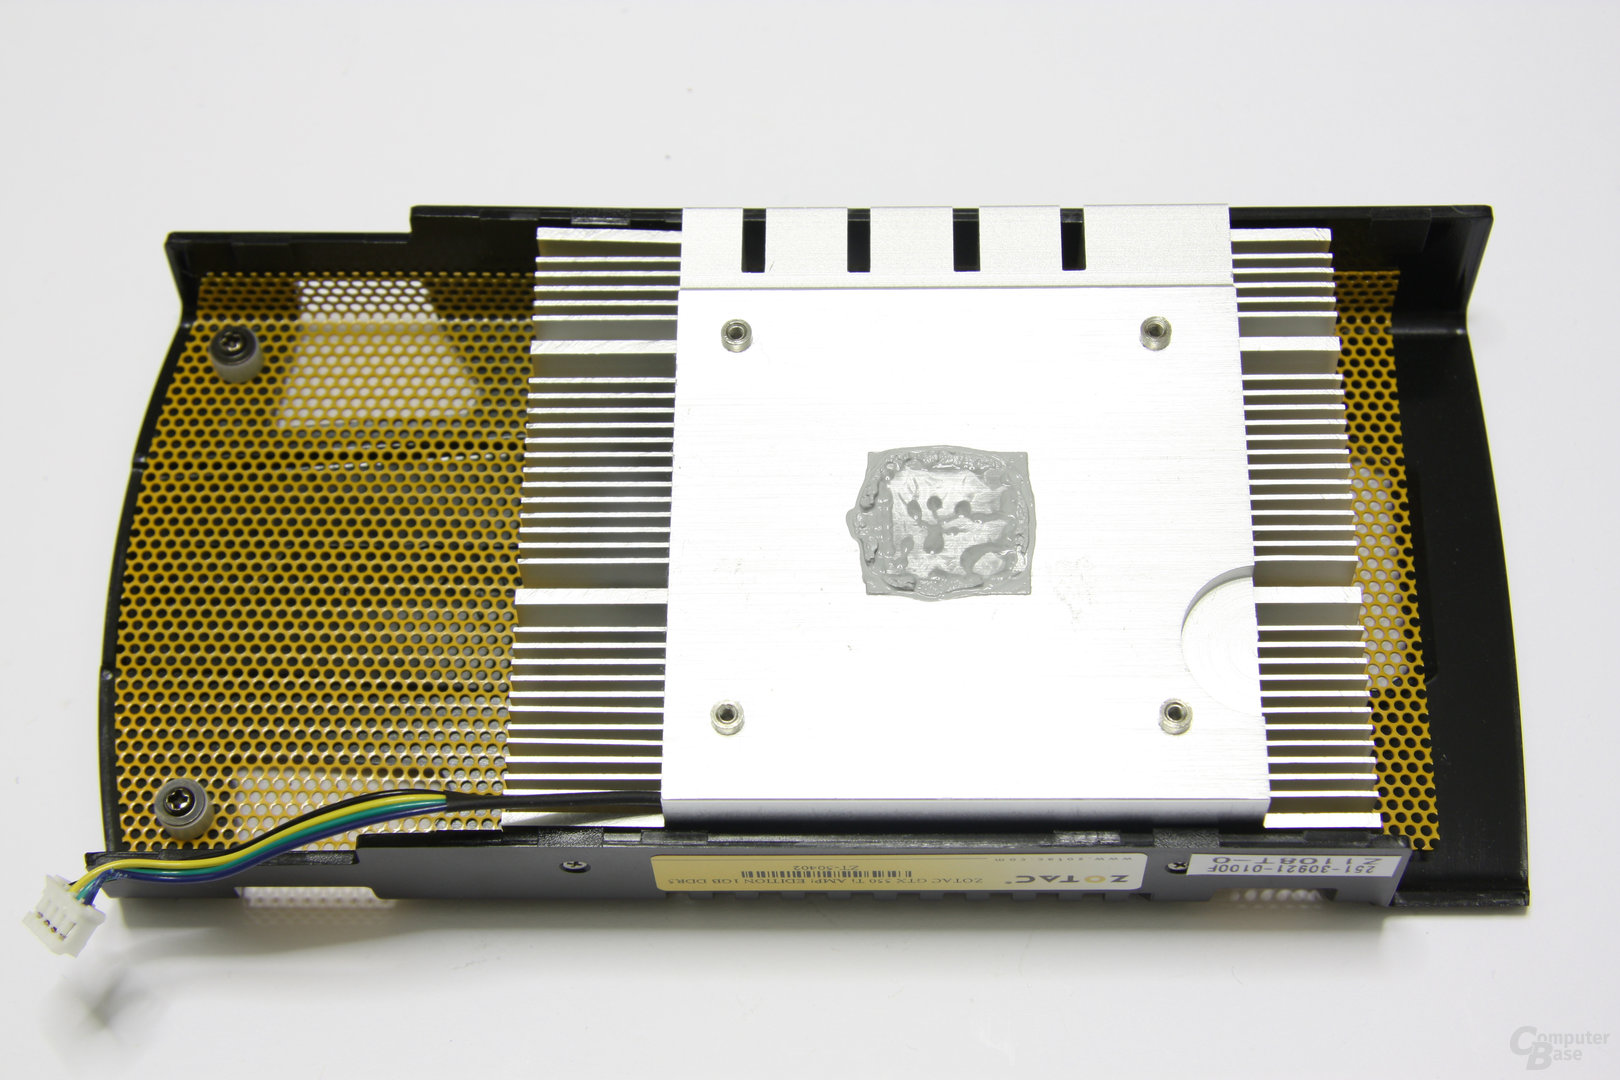 GeForce GTX 550 Ti AMP! Kühlerrückseite